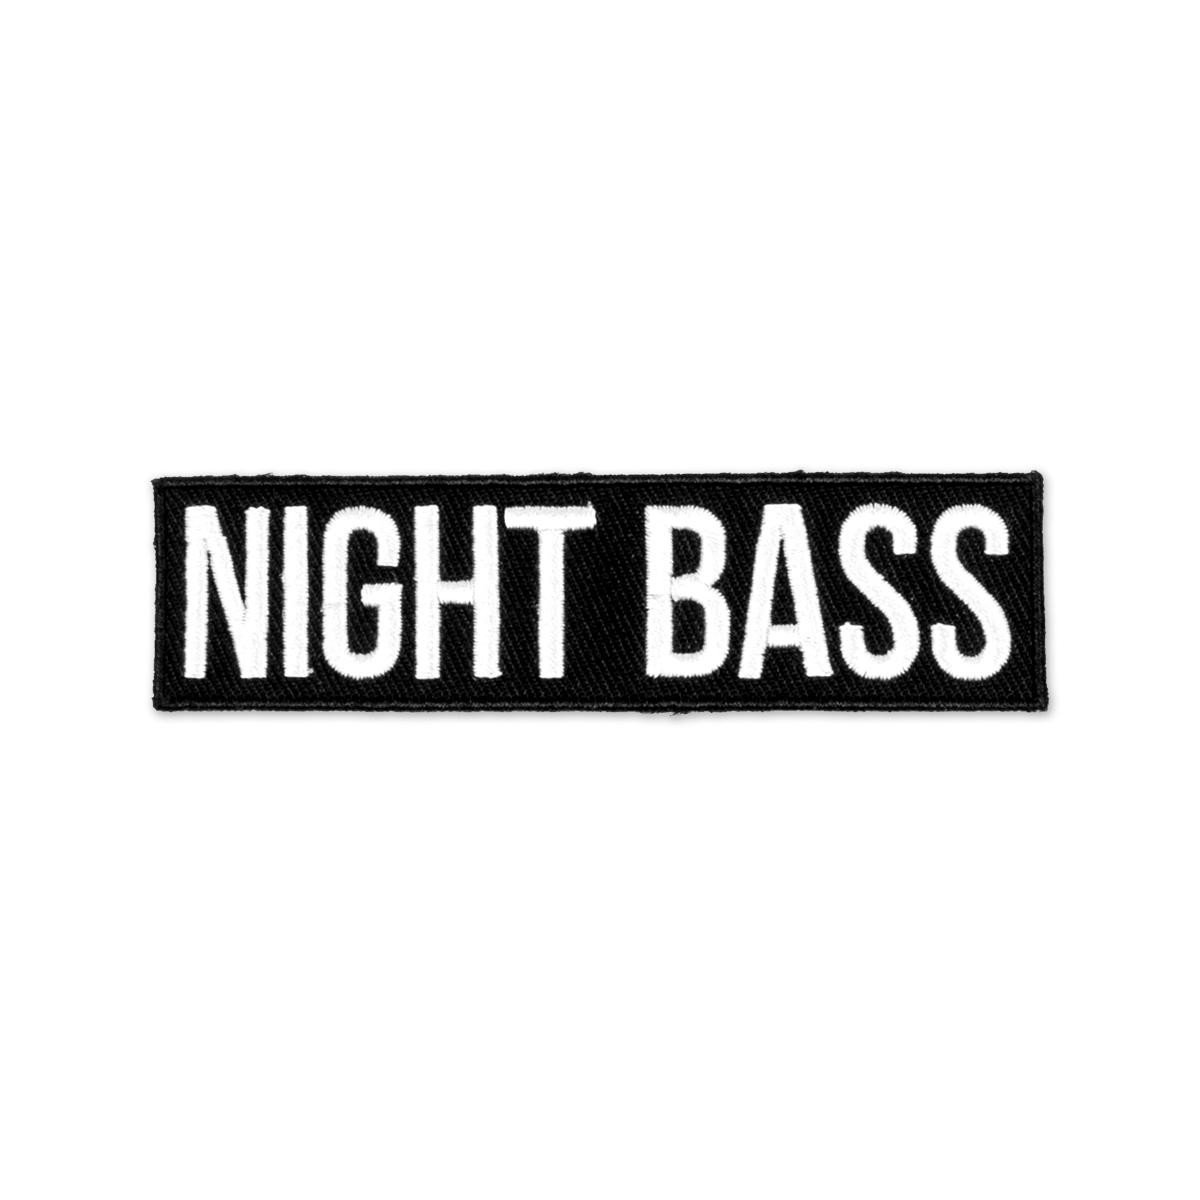 NIGHT BASS Patch